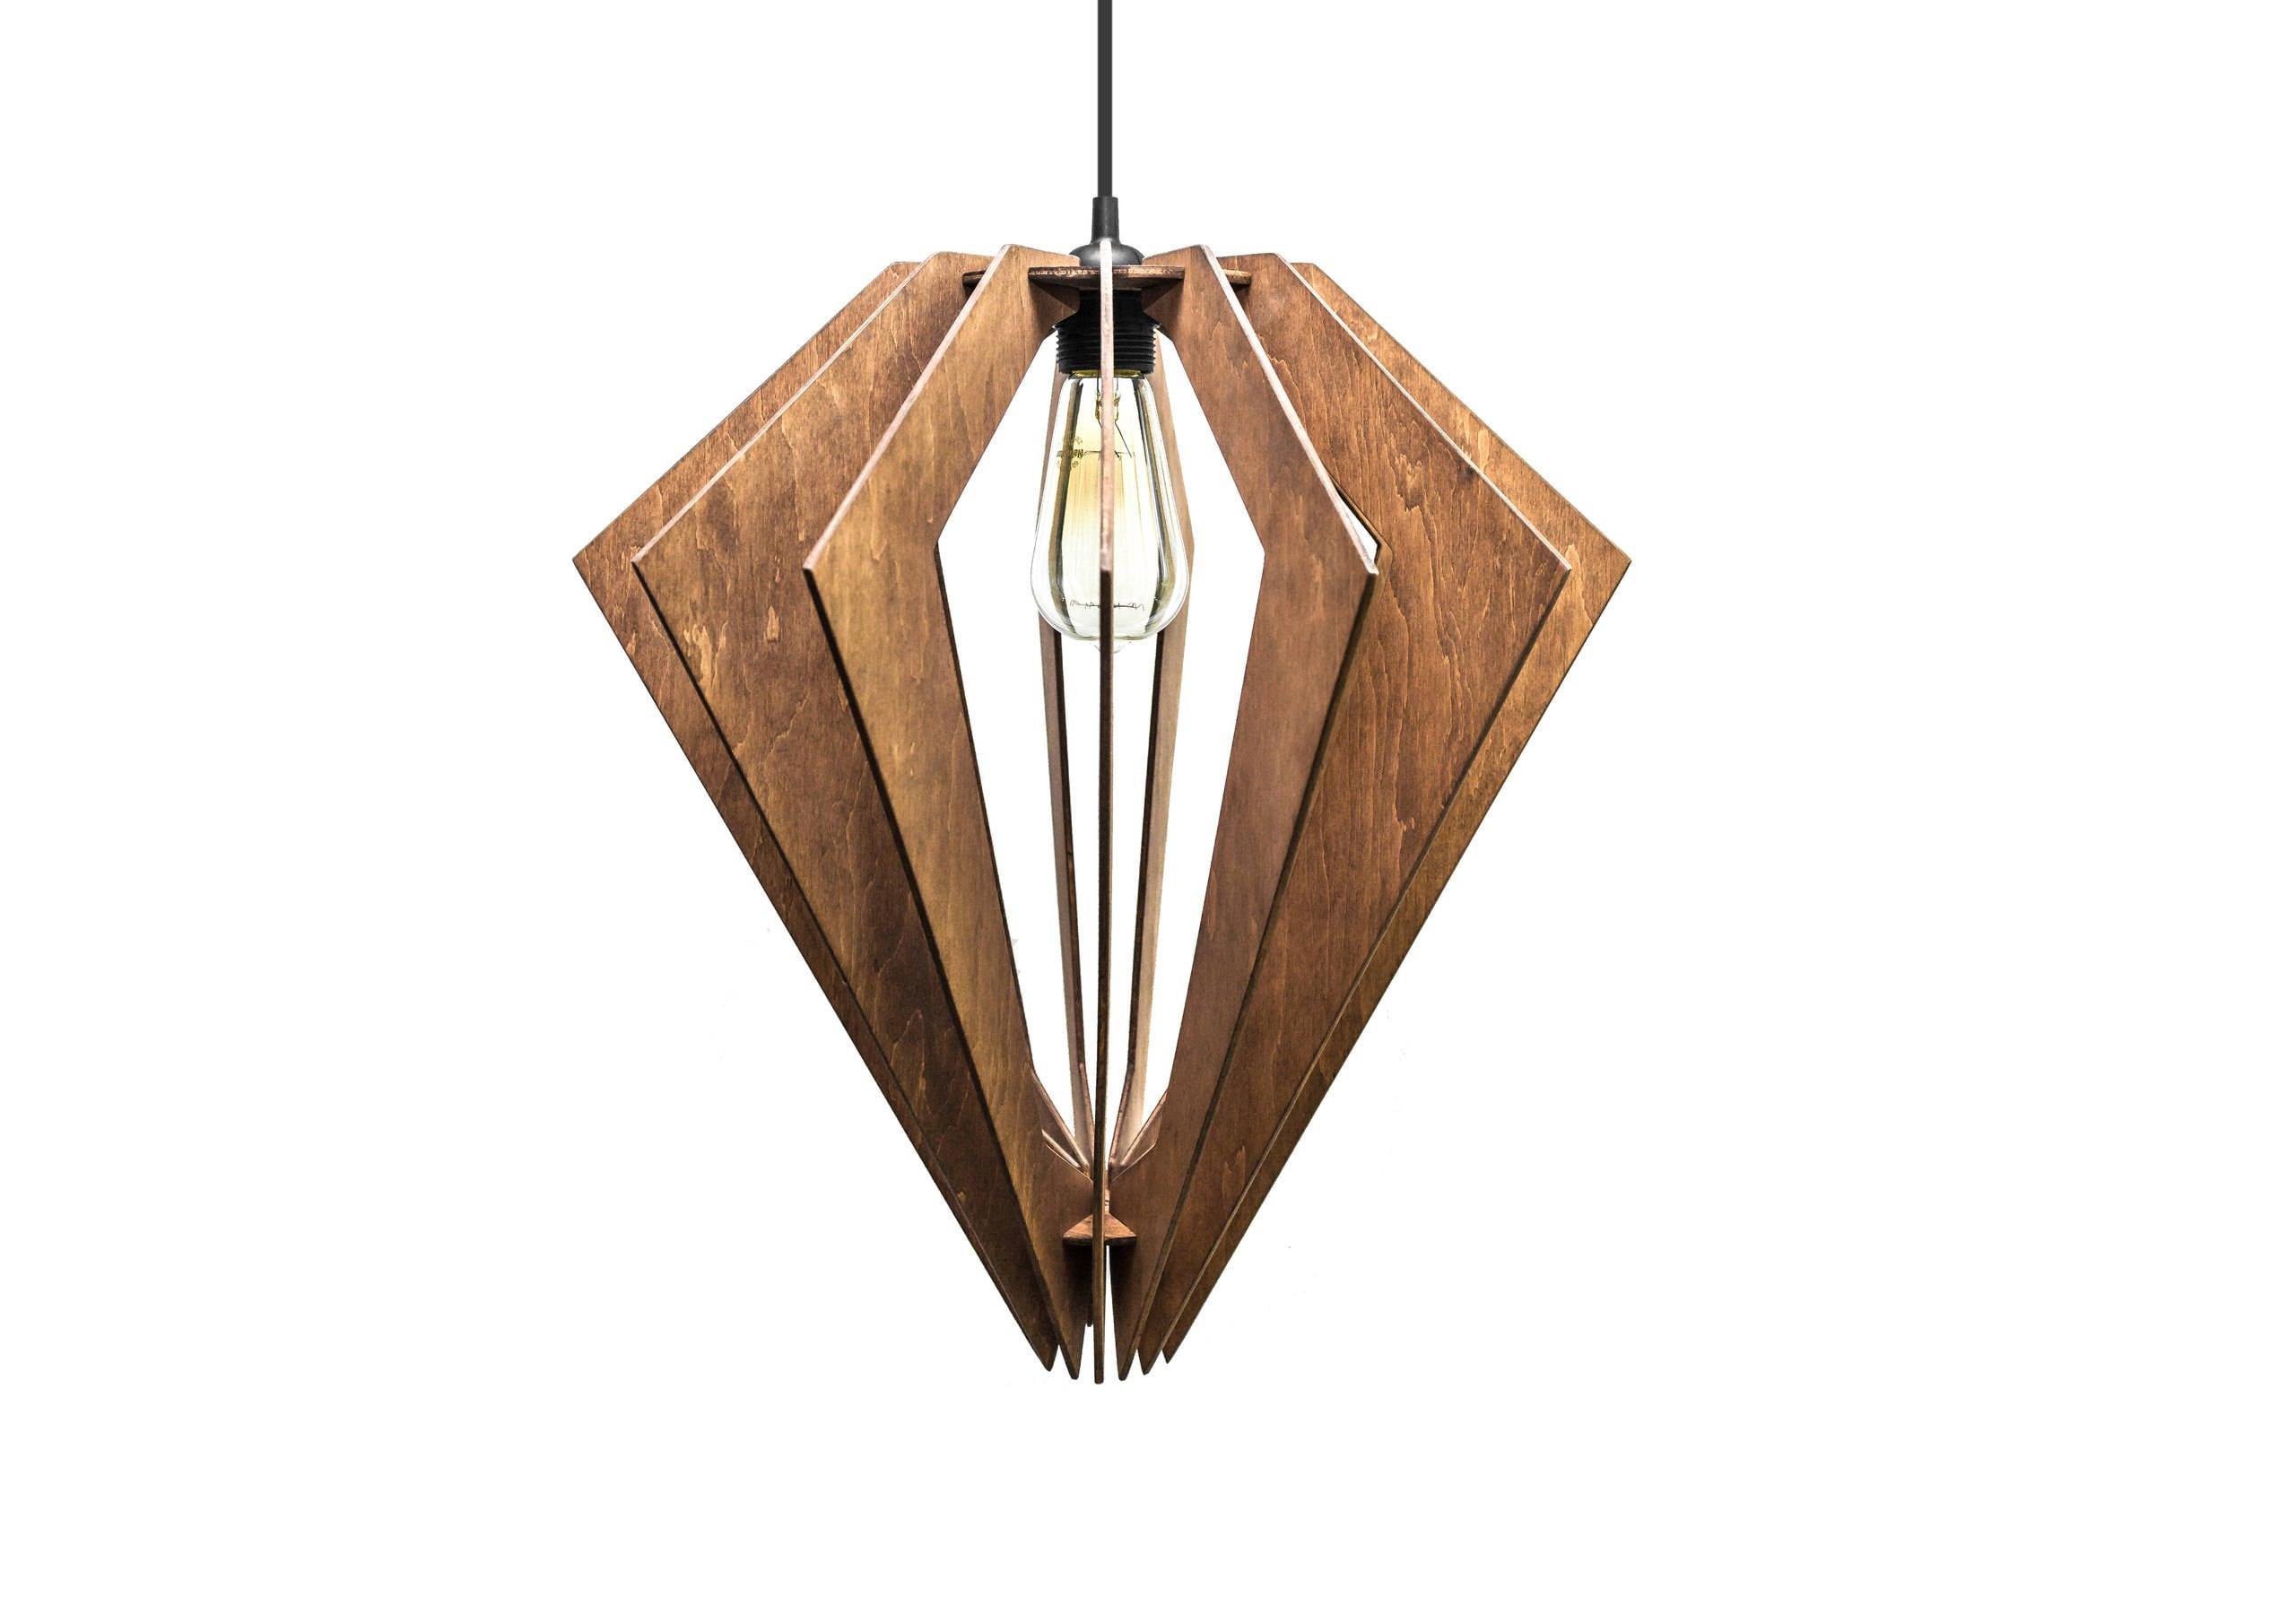 Pendant wood lighting dining room light fixture wooden ceiling for Wooden dining room light fixtures